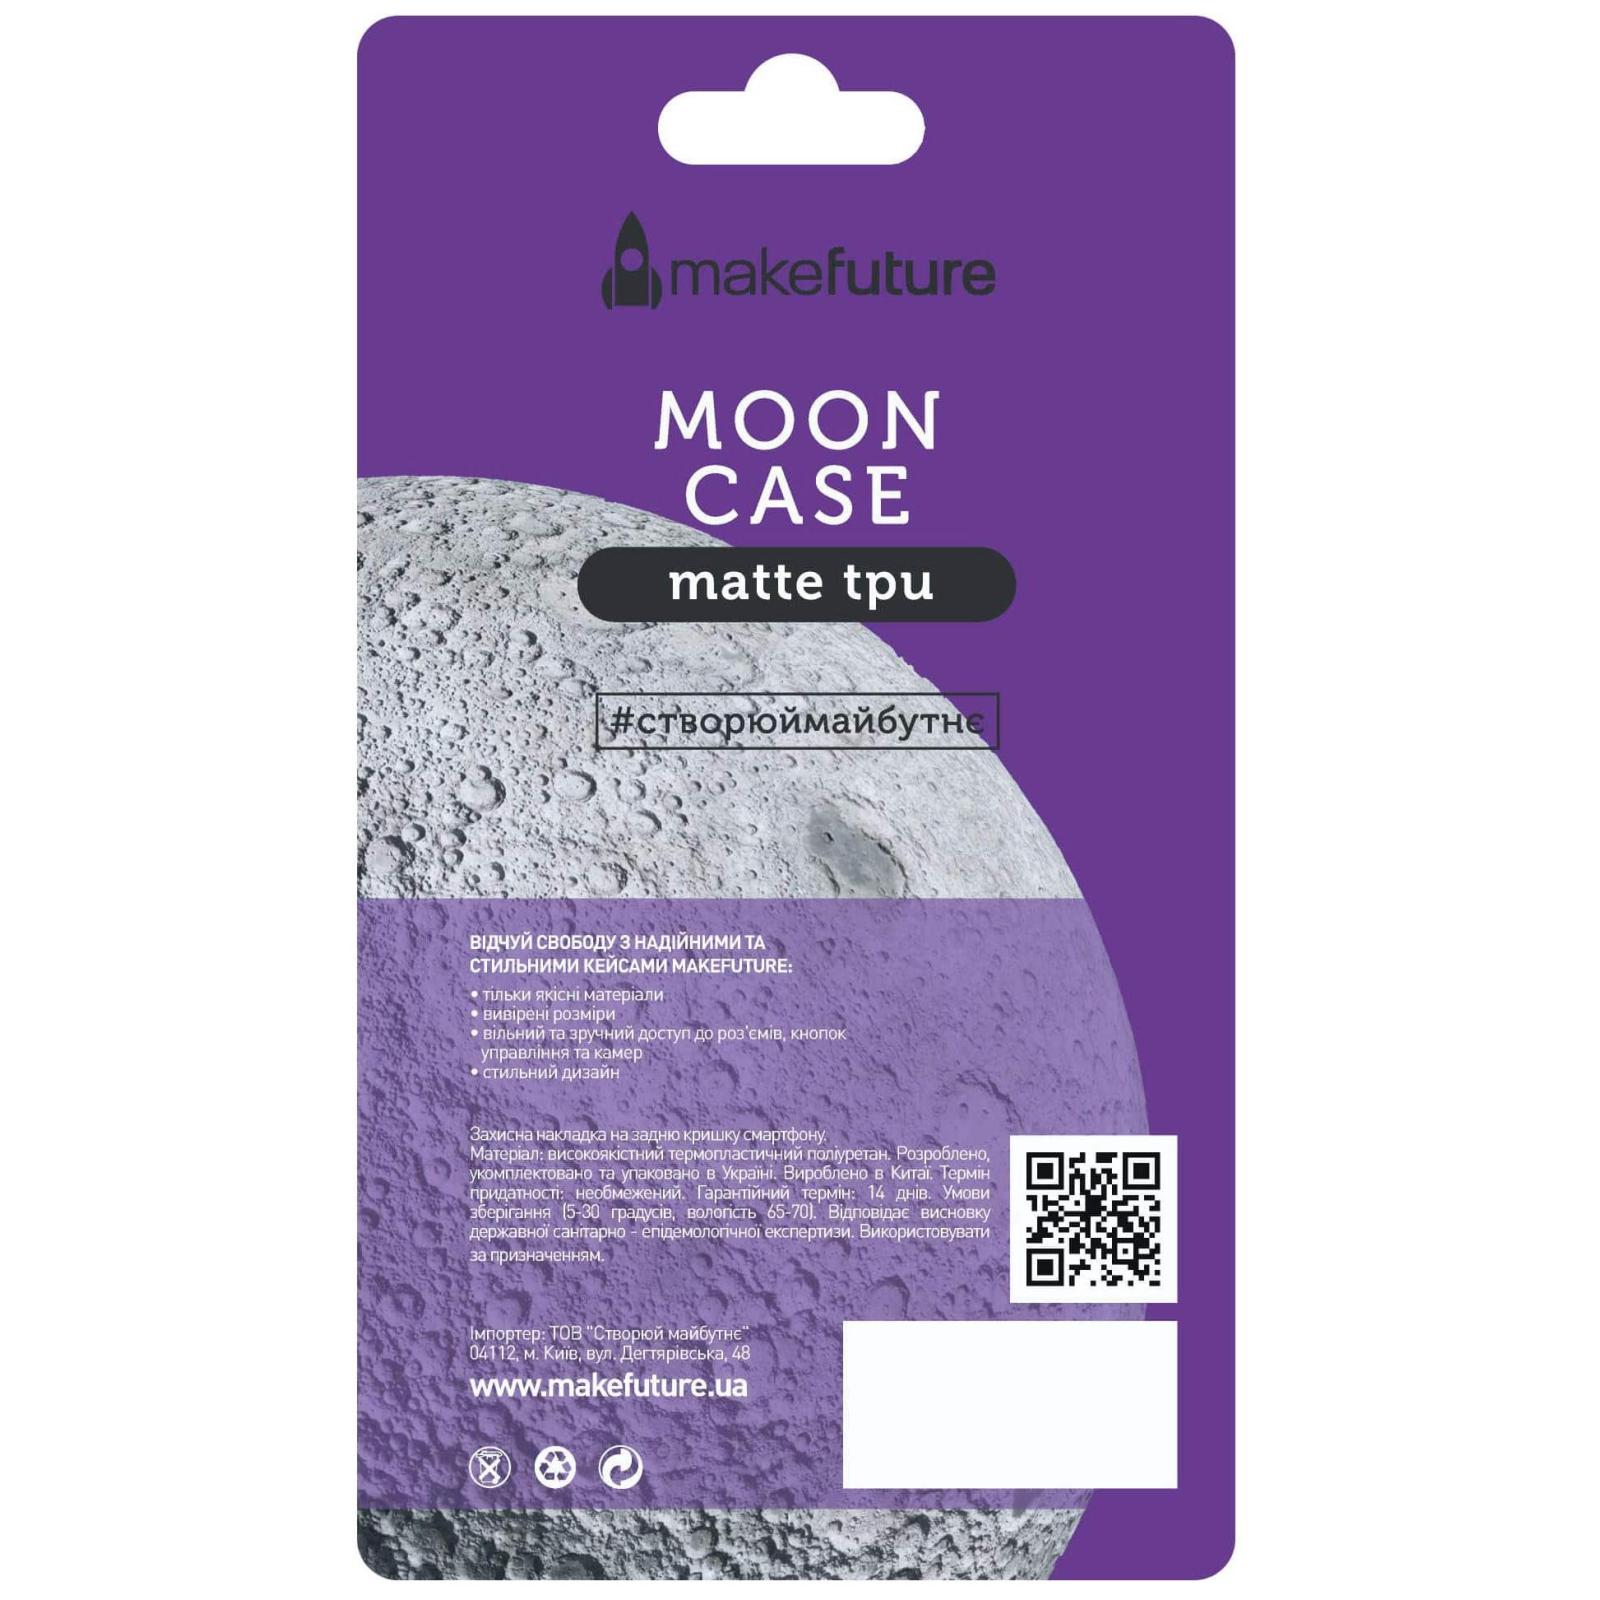 Чехол для моб. телефона MakeFuture Moon Case (TPU) для Apple iPhone 8 Plus Black (MCM-AI8PBK) изображение 5